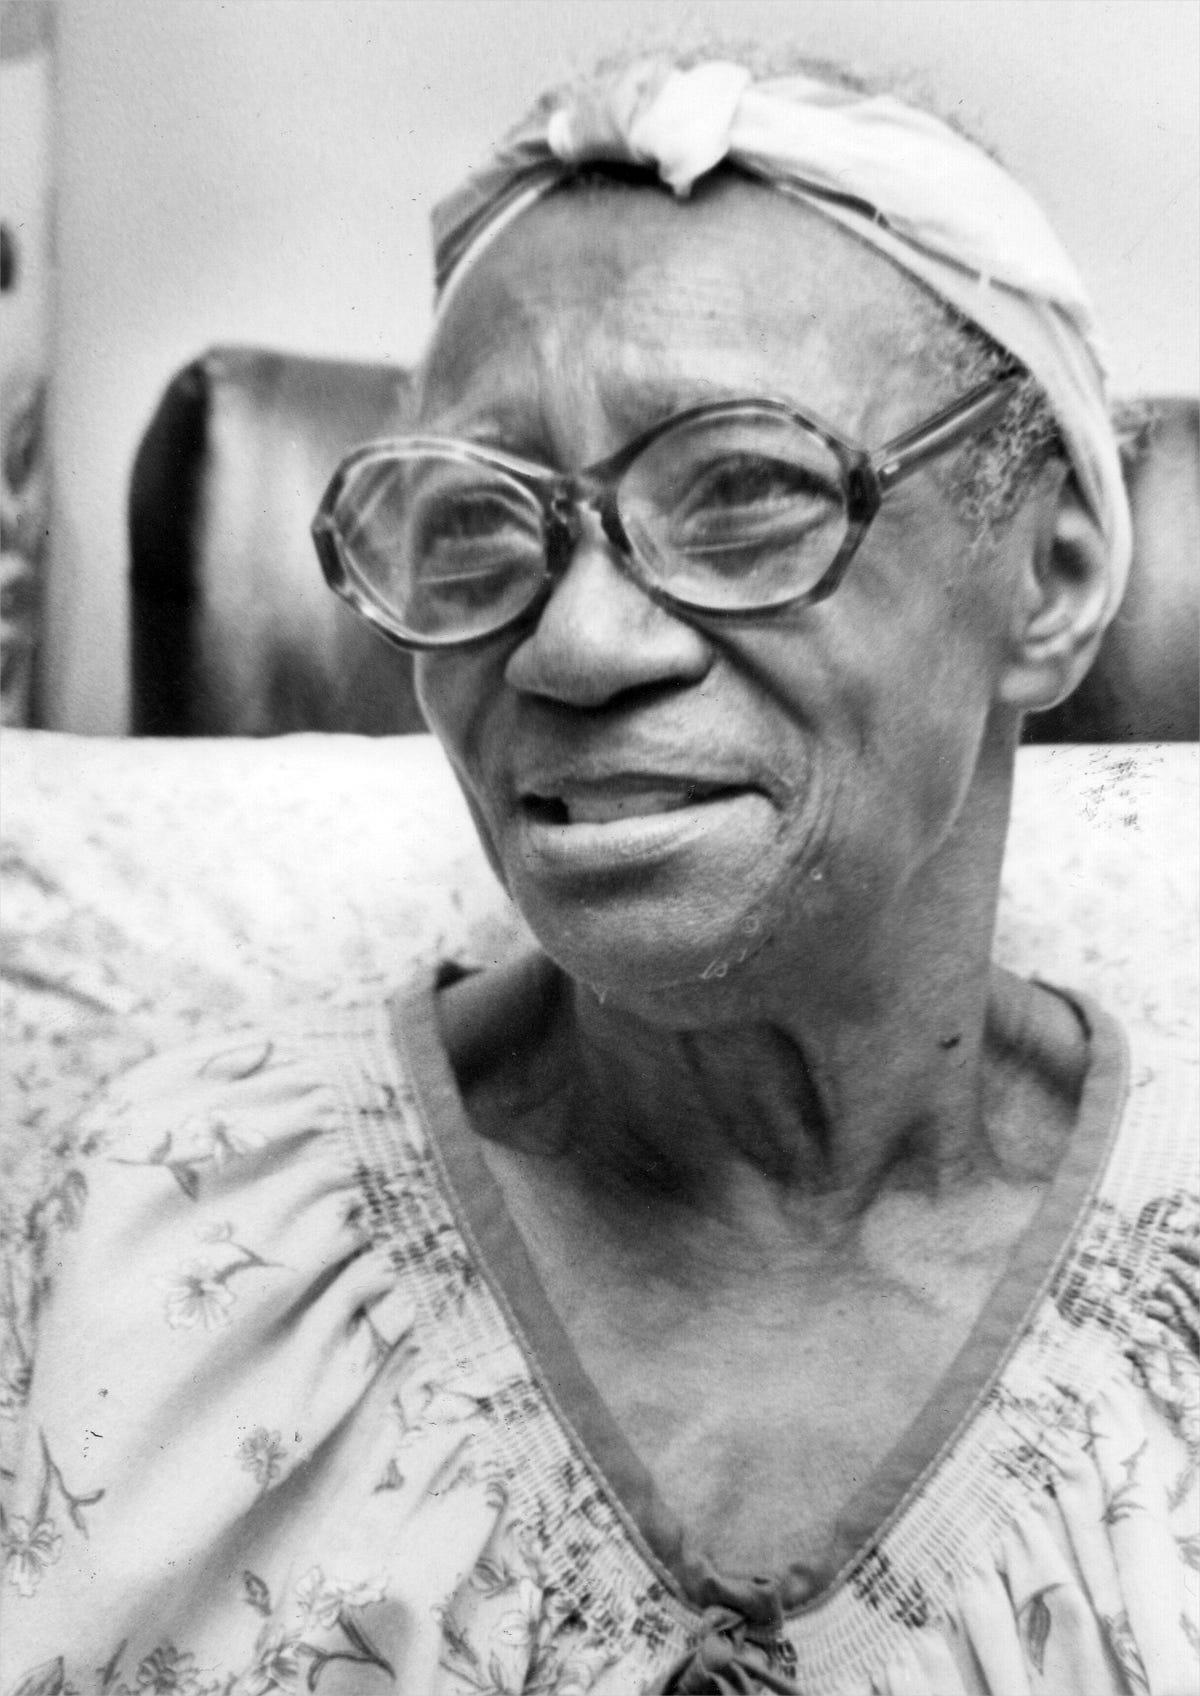 Jonestown massacre's only survivor — she woke up and everyone was dead